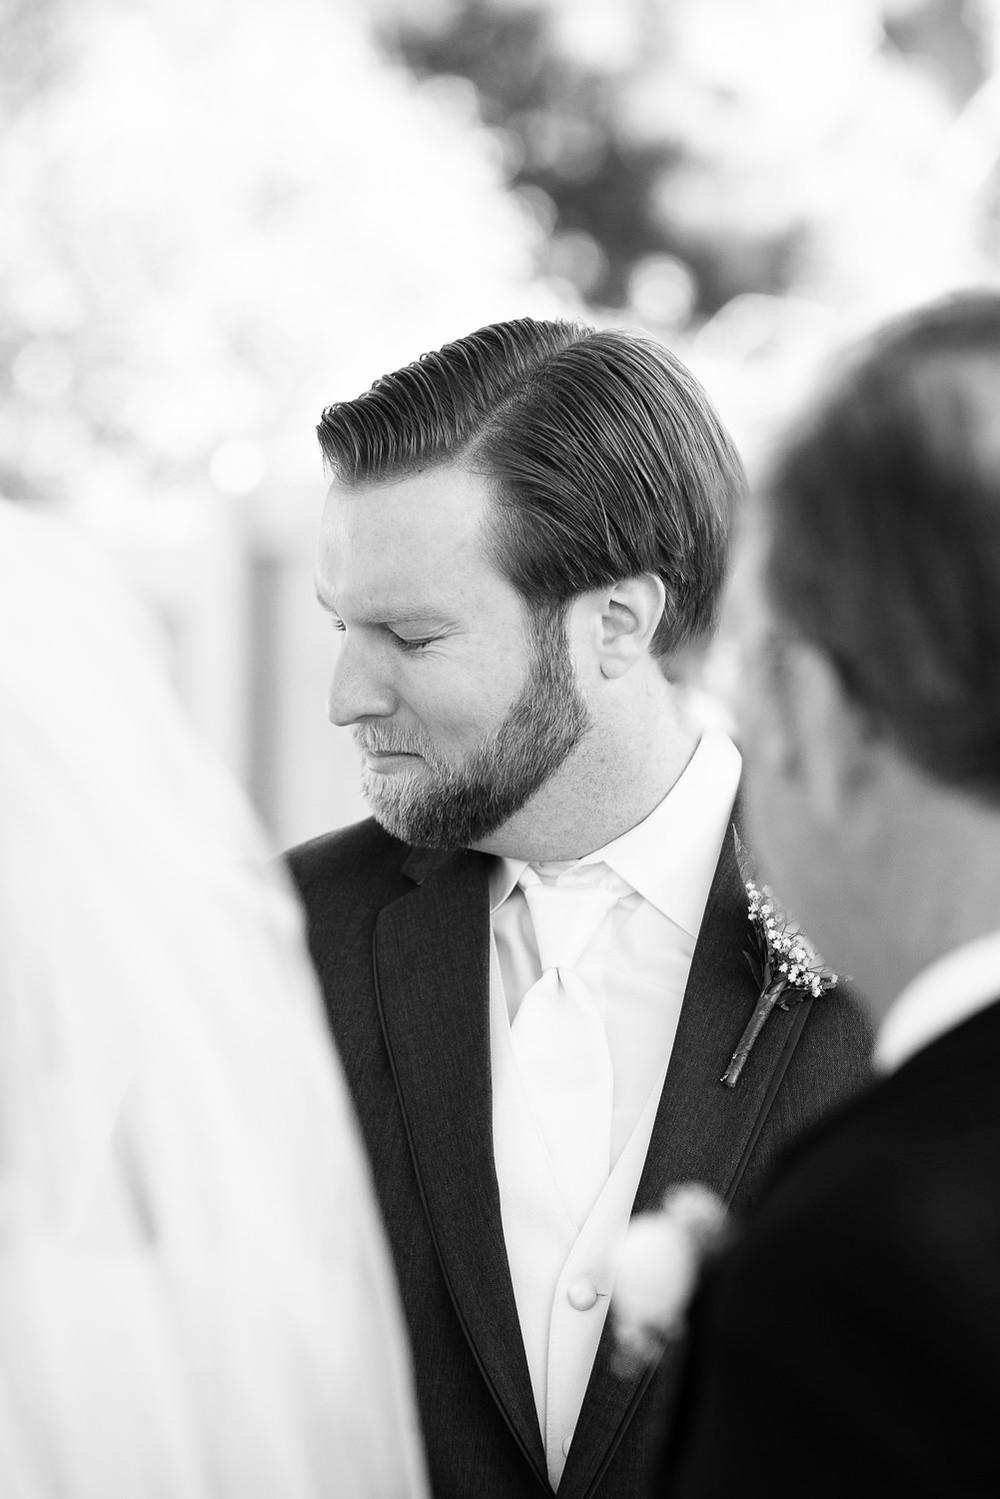 f27-Photography-Ojai-Wedding-February-2014-Emotional-Groom-Tears